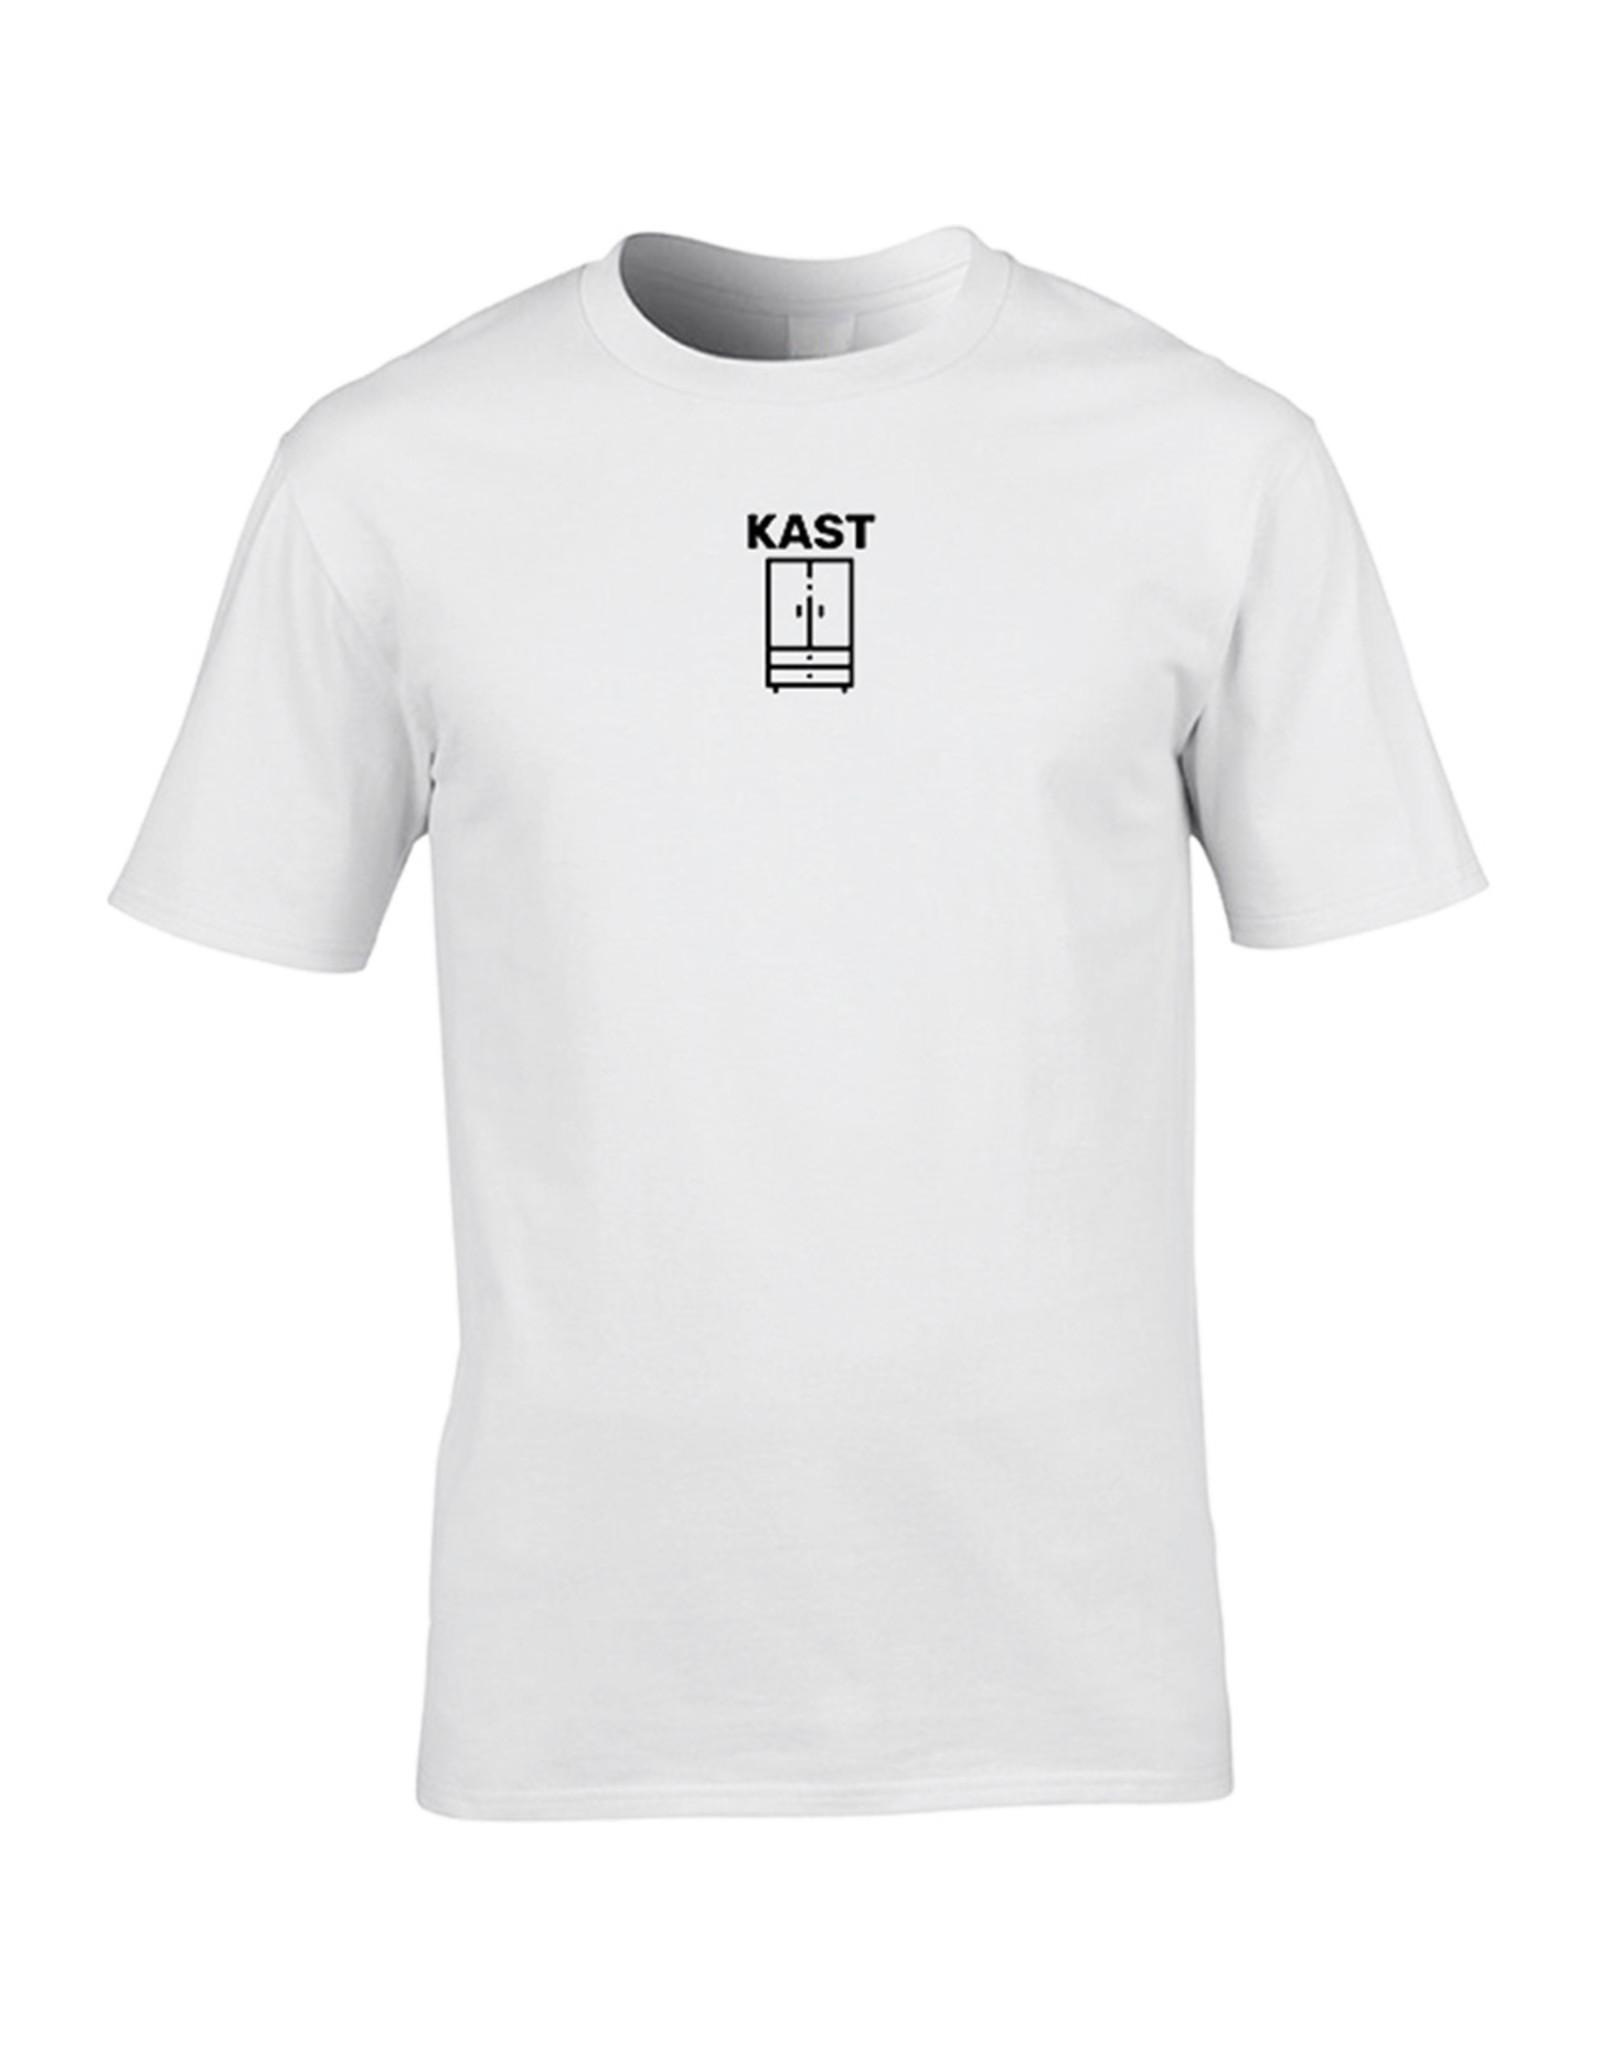 Festicap T-Shirt Kast | Soft Cotton | Handmade by us